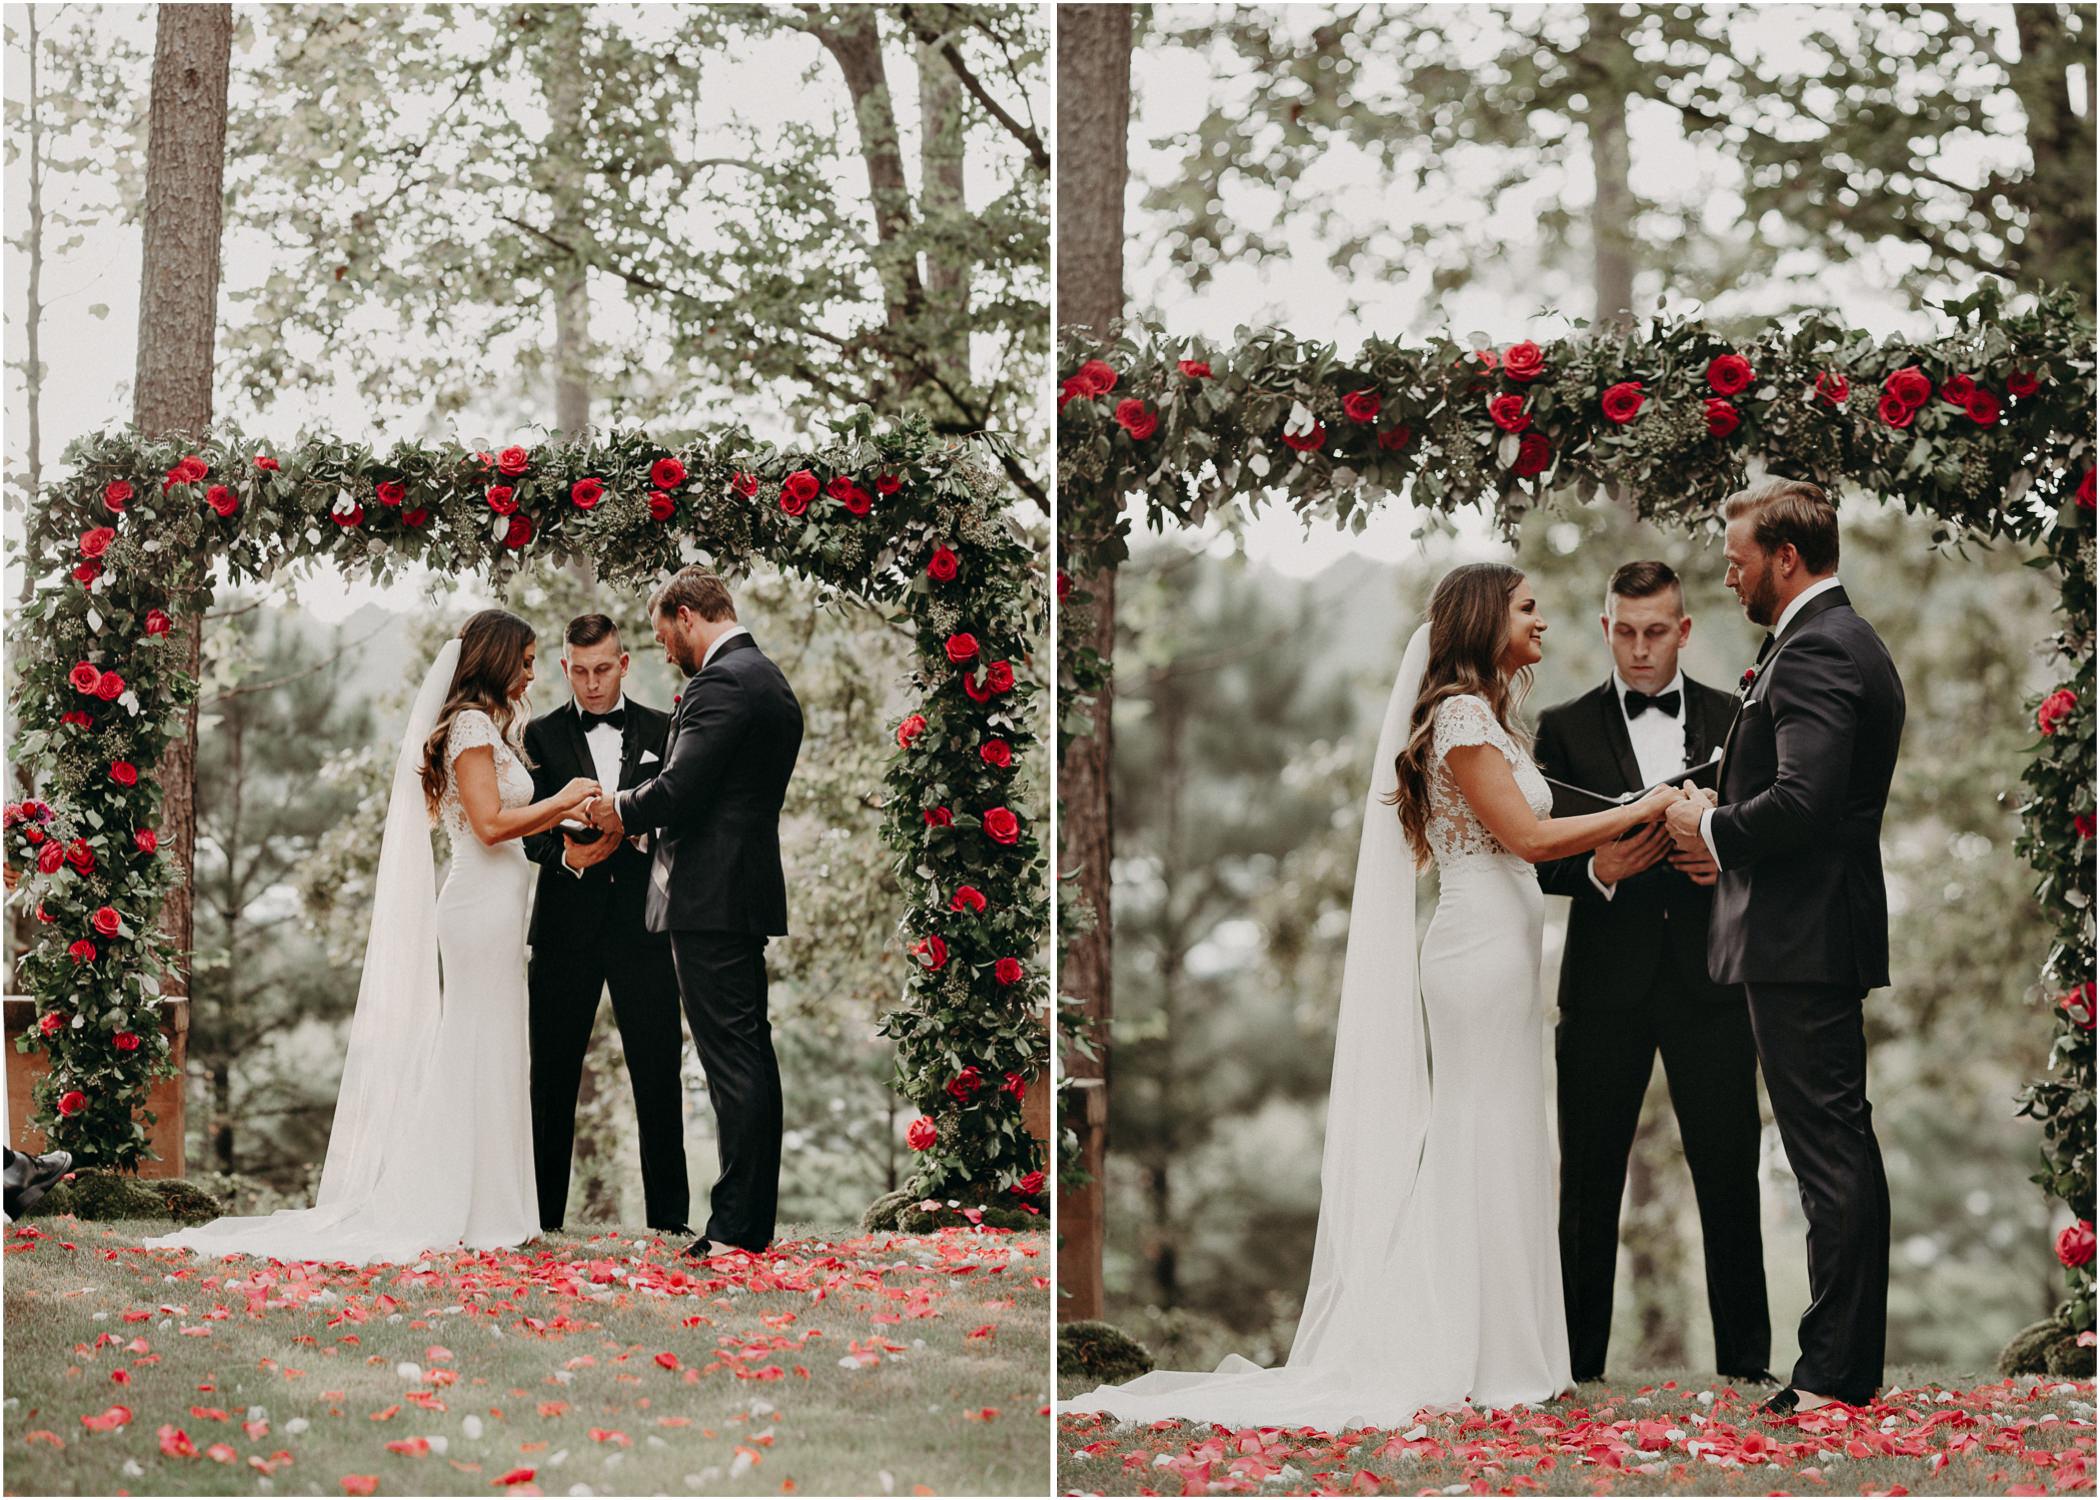 69 - Exchange of vows at wedding ceremony at serenbi farms atlanta .jpg